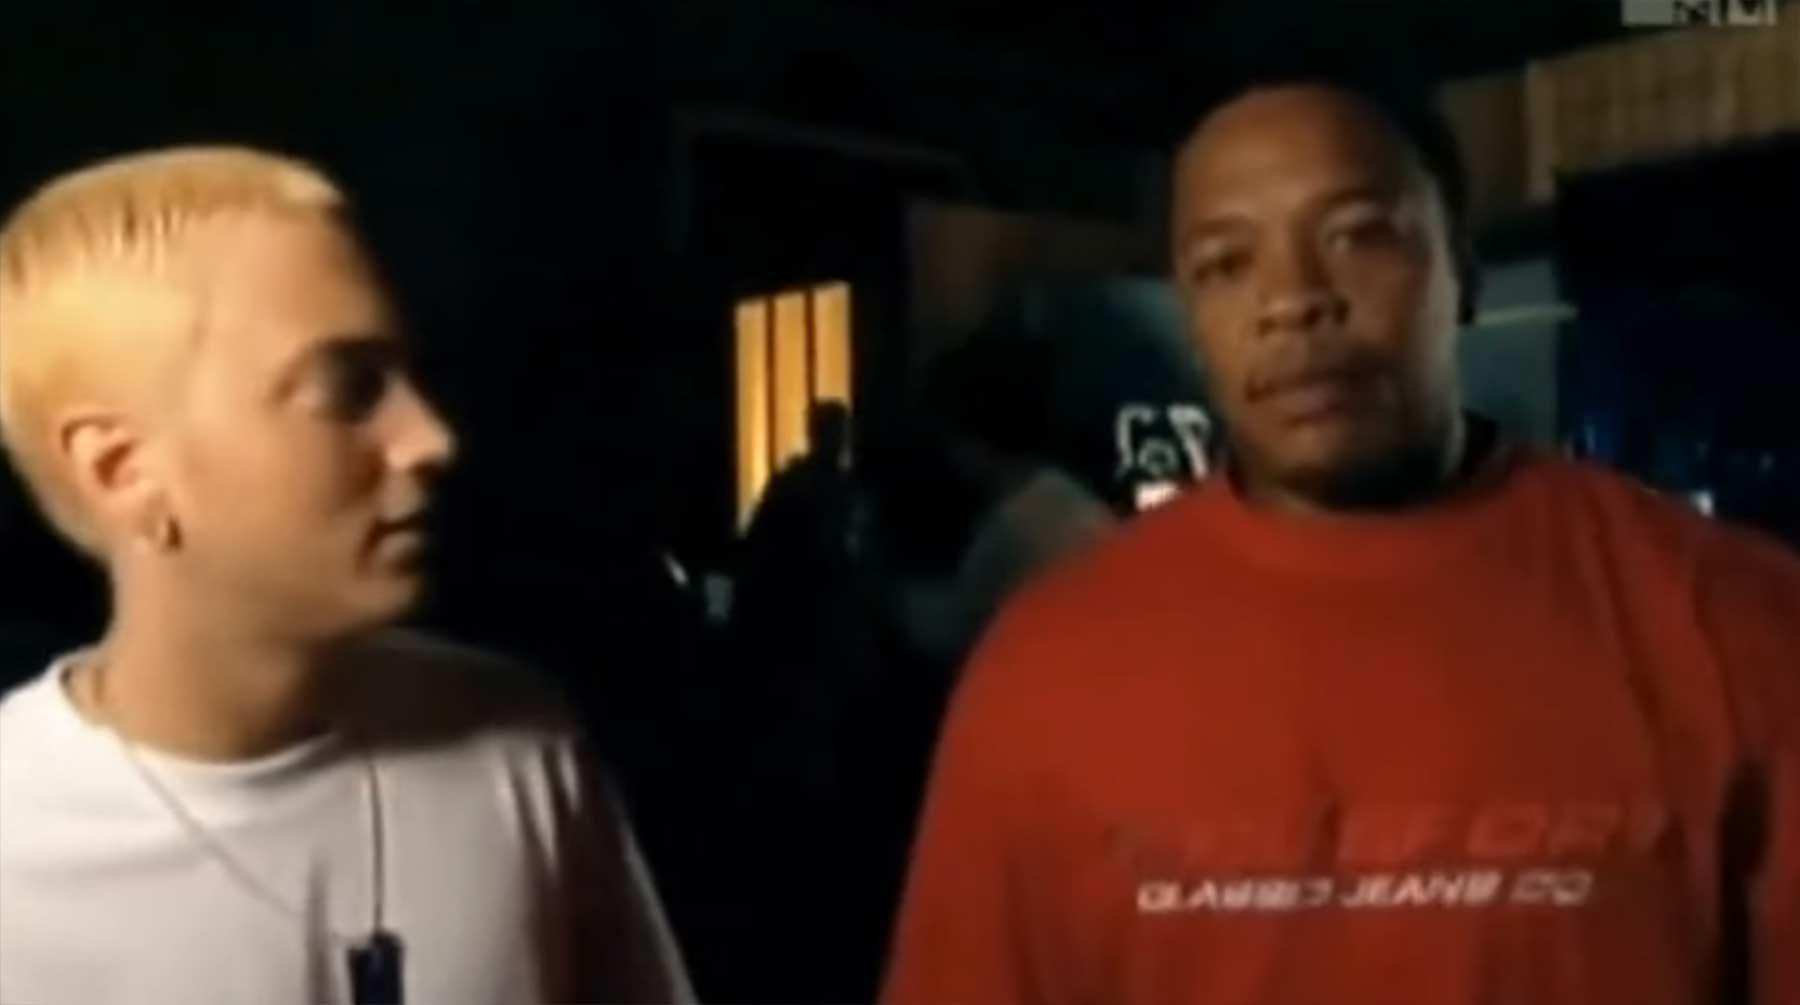 Wie Eminem von Dr. Dre entdeckt wurde eminem-dr-dre-entdeckung